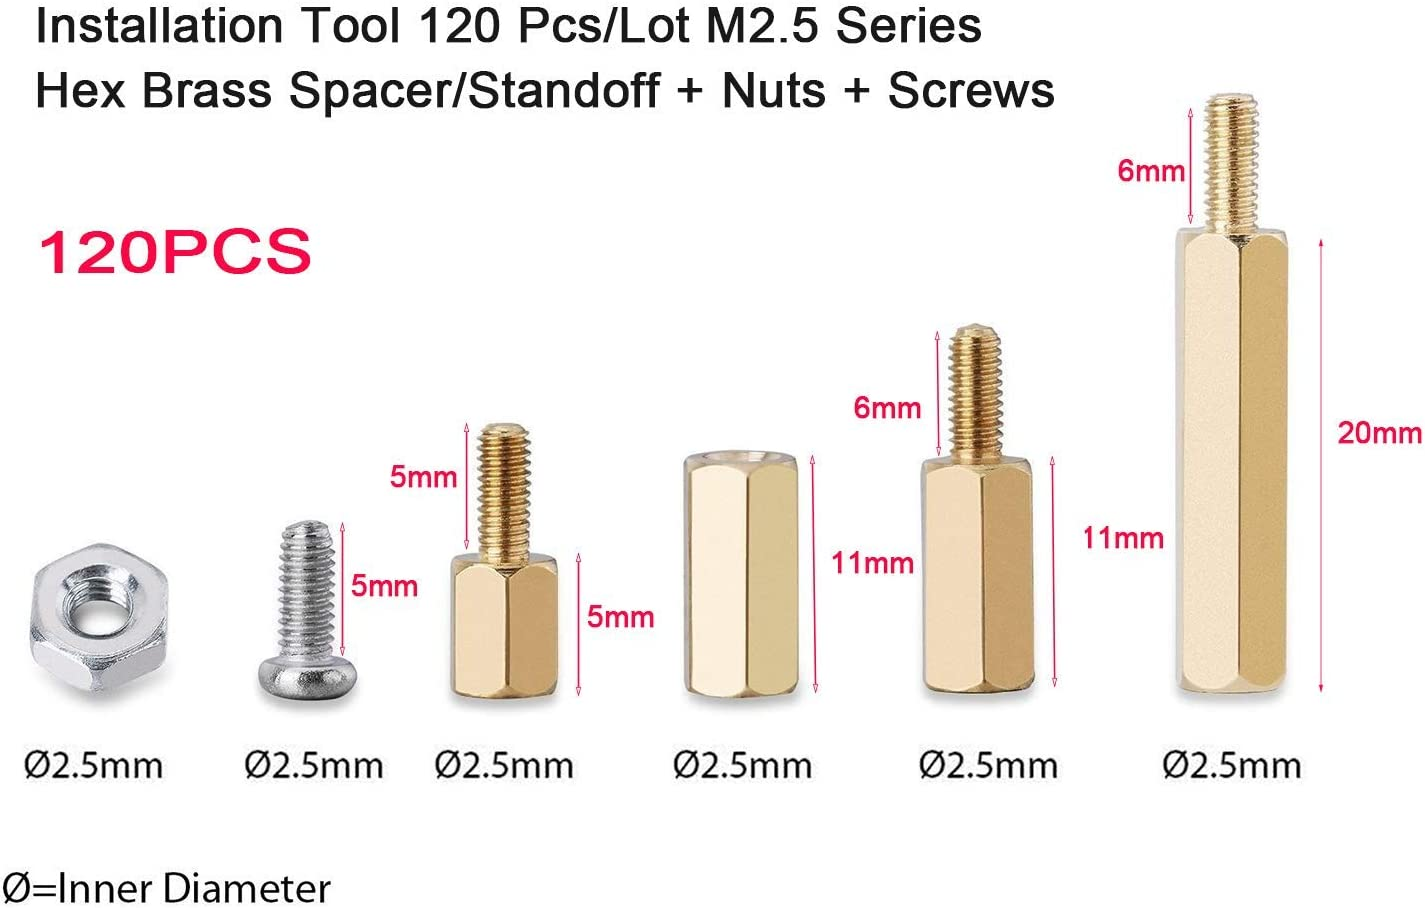 Nuts Michaelia Installation Tool 120 Pcs//Lot M2.5 Series Hex Brass Spacer//Standoff // 3B // Zero W Accessories Kit Plus Screws w//Storage Case Raspberry Pi 3 Model B+